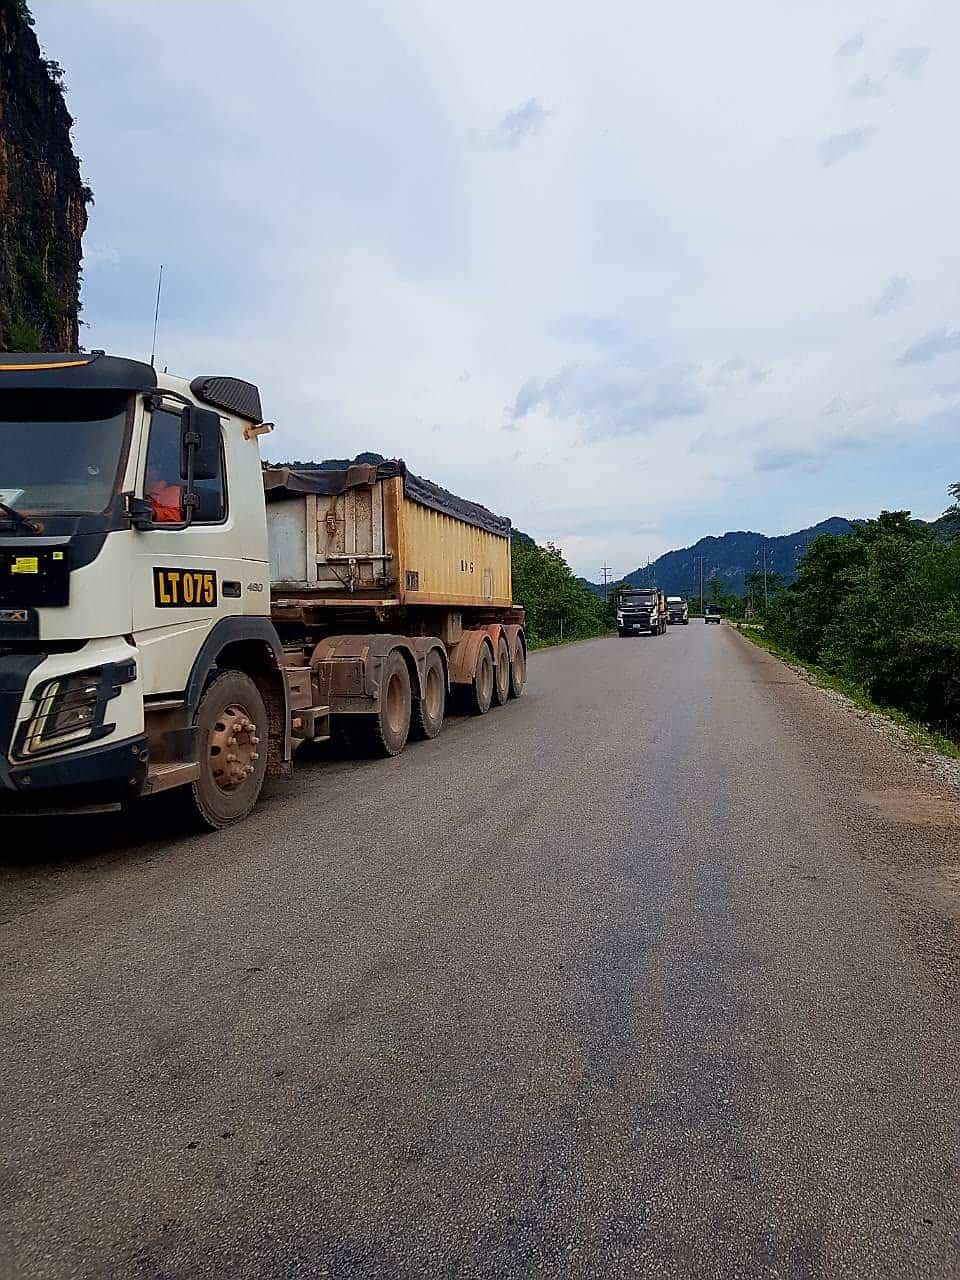 Laos, la boucle de Thakhek à moto 🛵 3